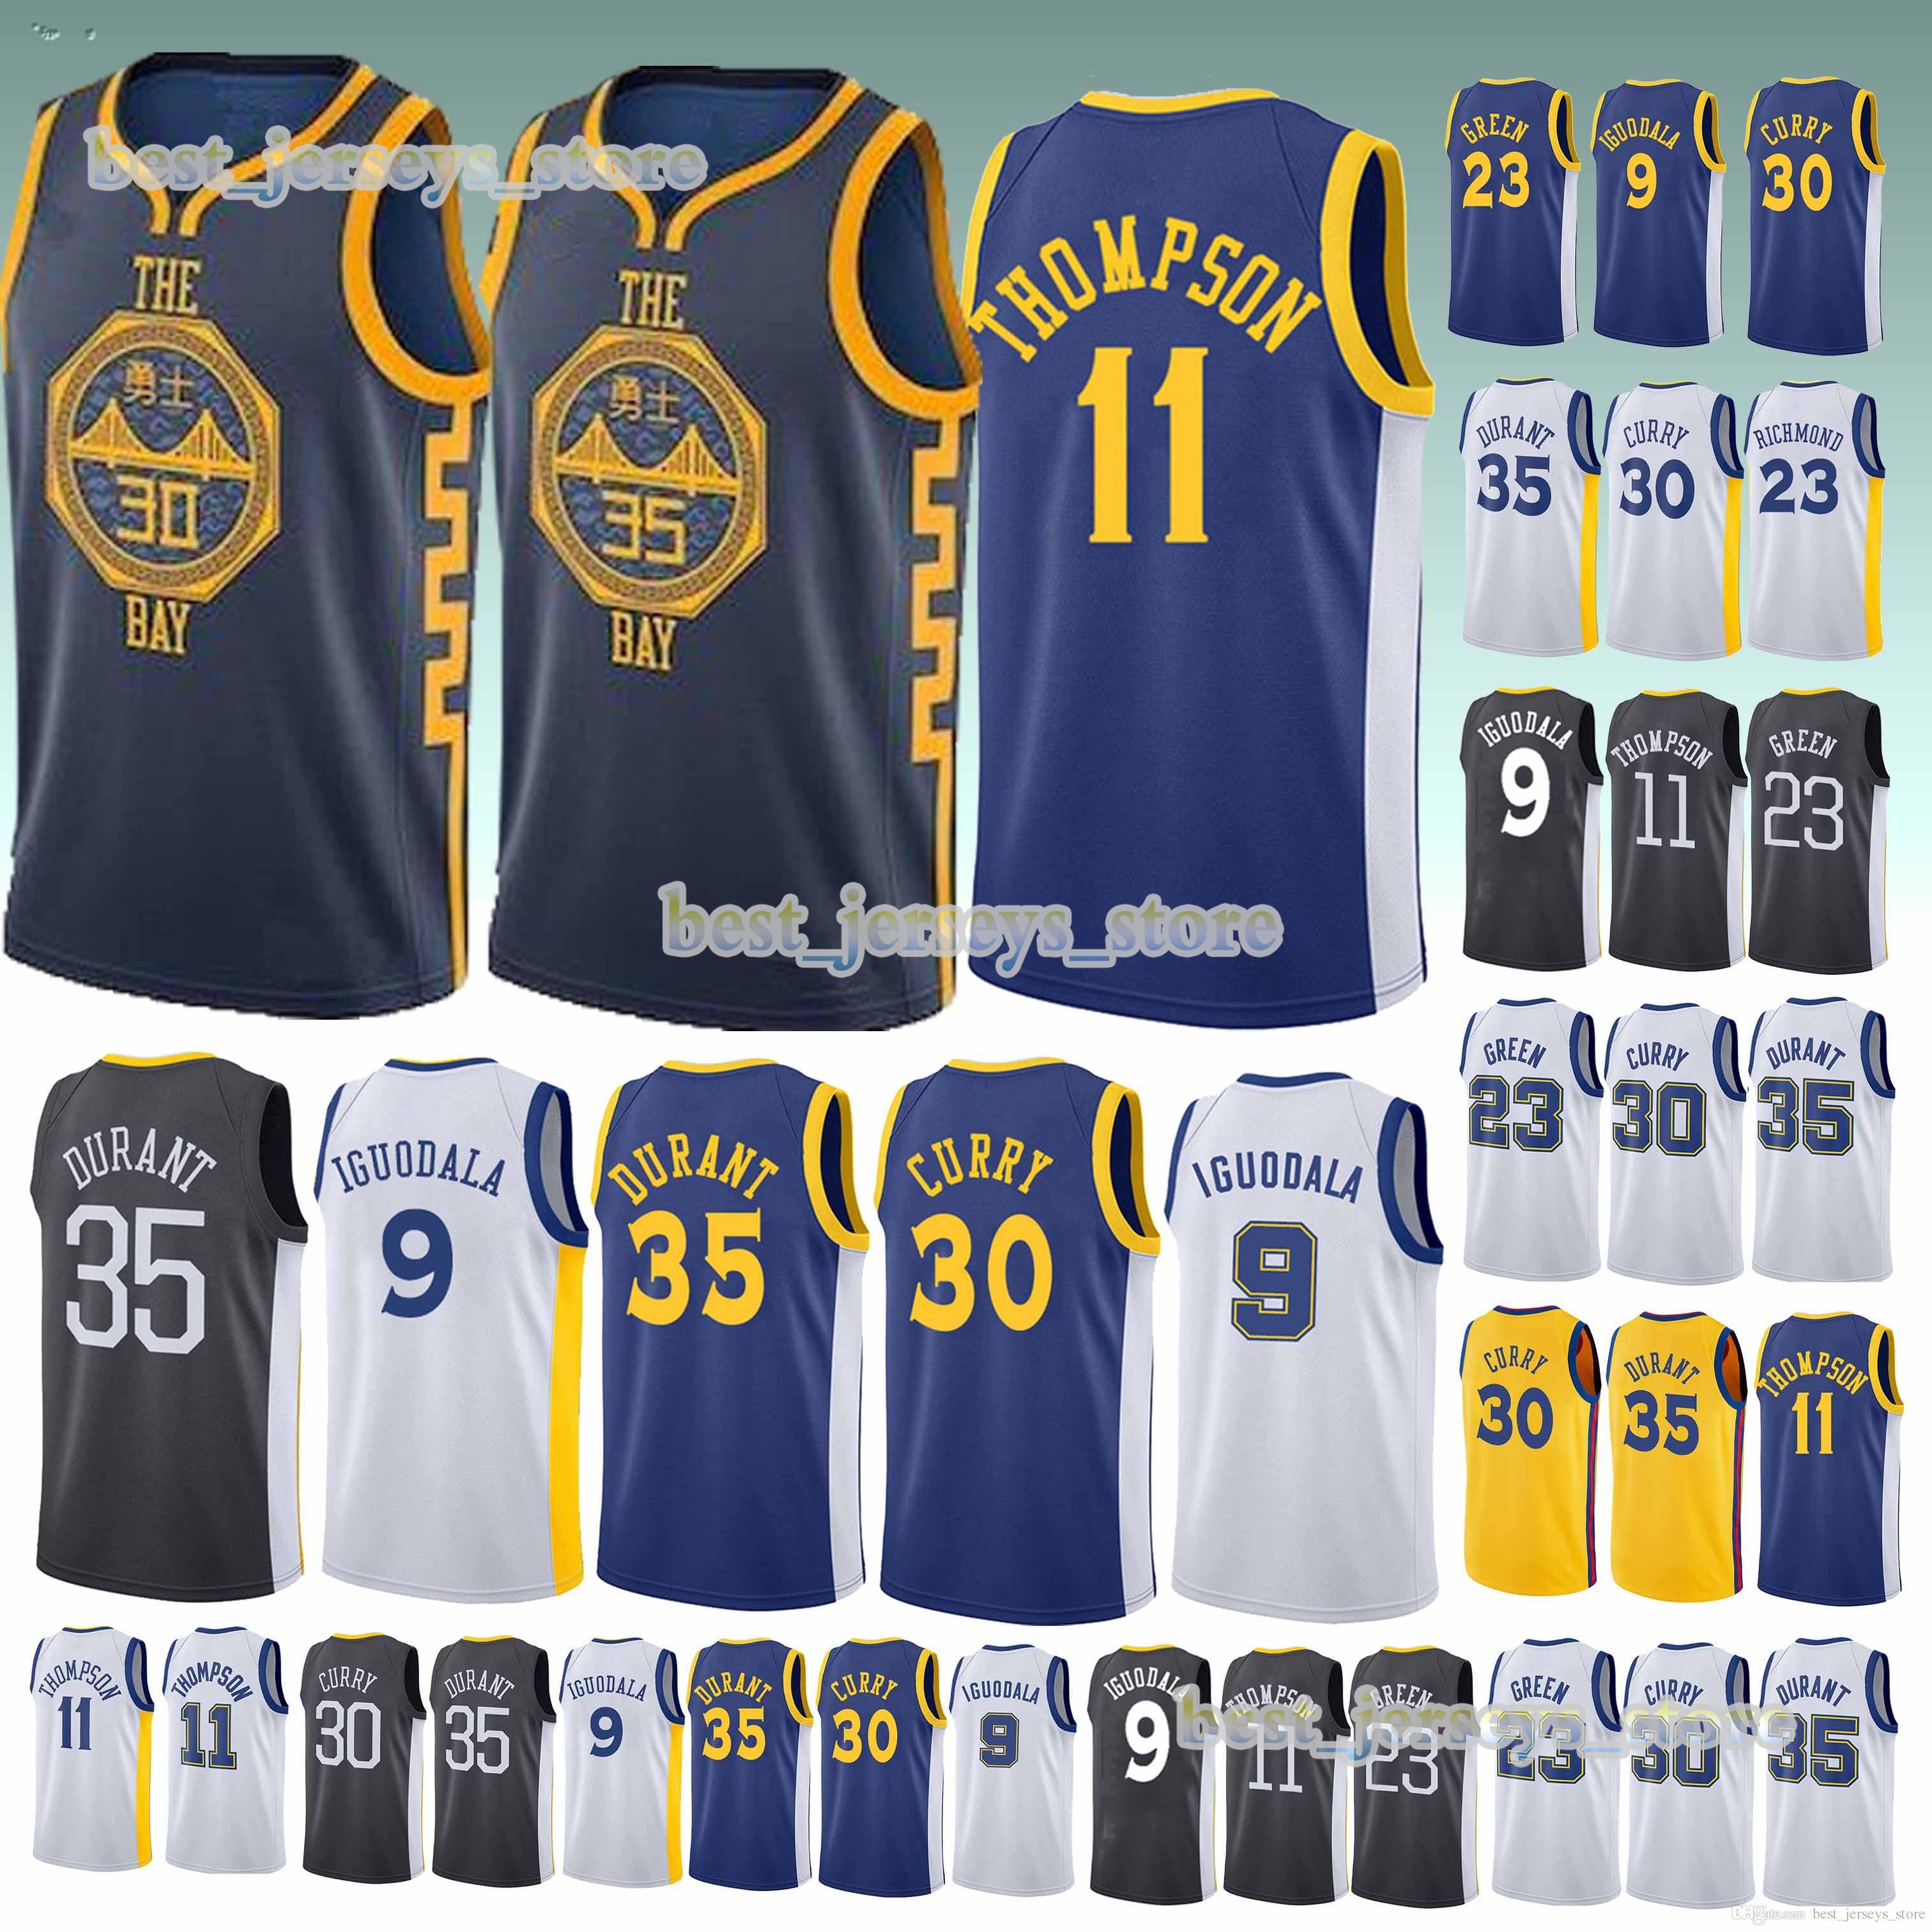 promo code a7832 eb458 11 Thompson 9 lguodala 30 Curry 35 Durant jersey 23 Green Basketball  Jerseys 2019 Design sweater